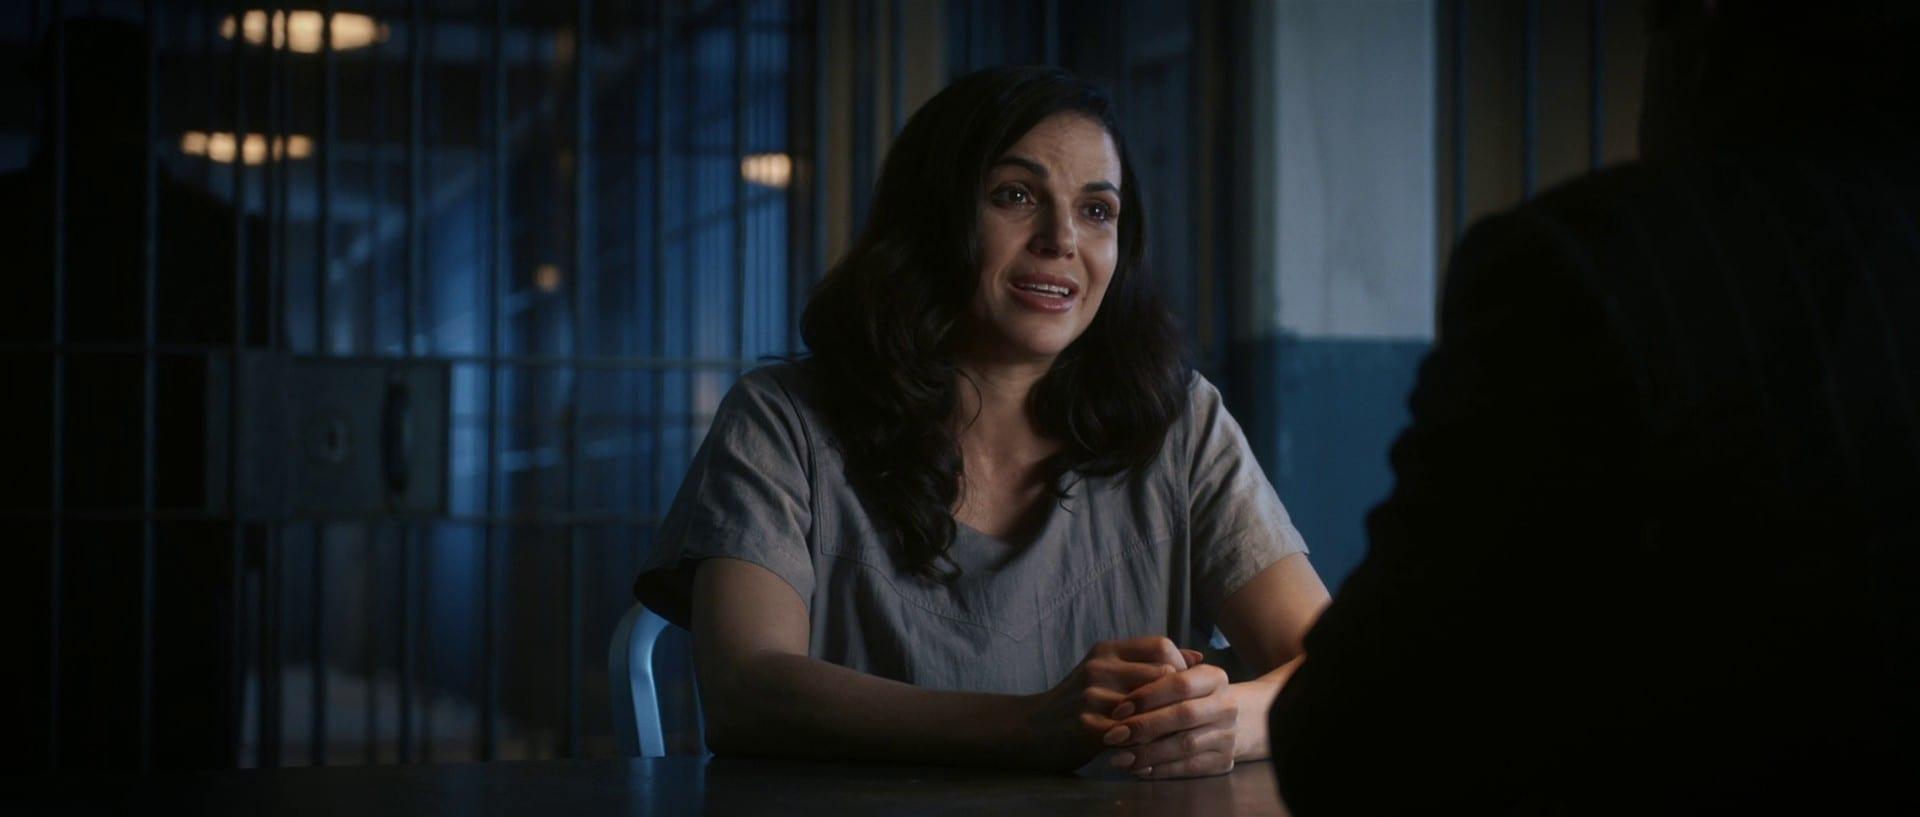 Spoilers For Why Women Kill Season 2 Episode 9